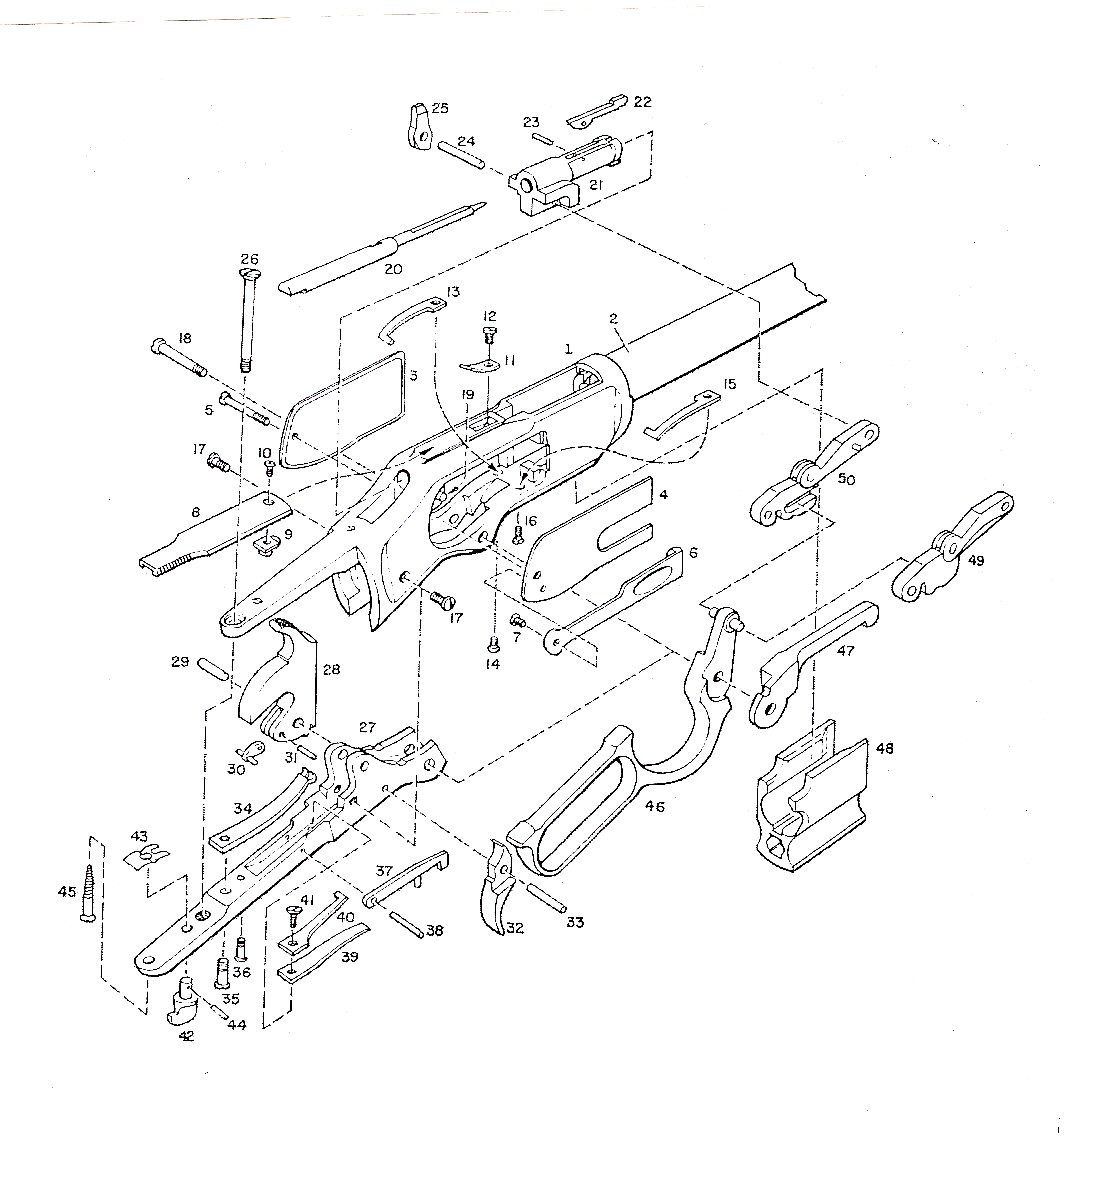 Winchester bob s gun shop gun parts for many winchester models rh gun parts manuel